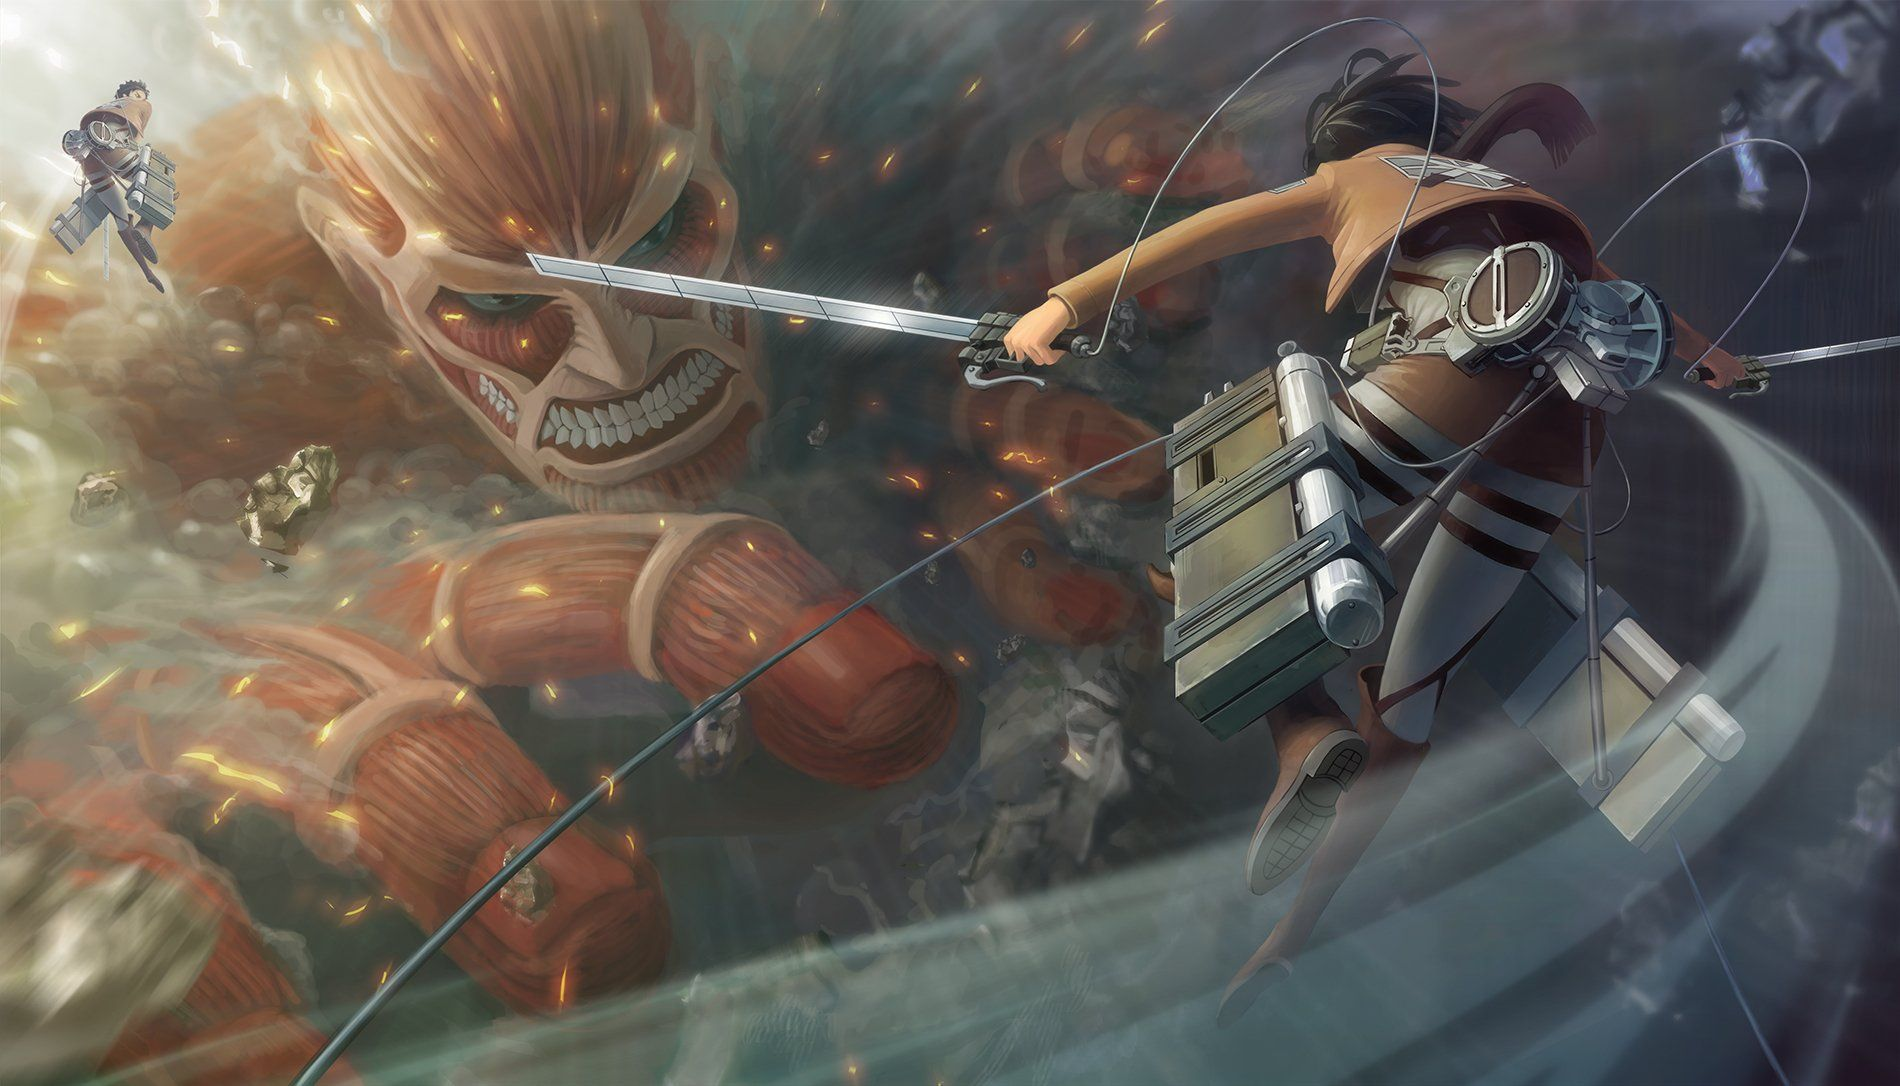 Anime L'Attaque des Titans Mikasa Ackerman Titan Shingeki